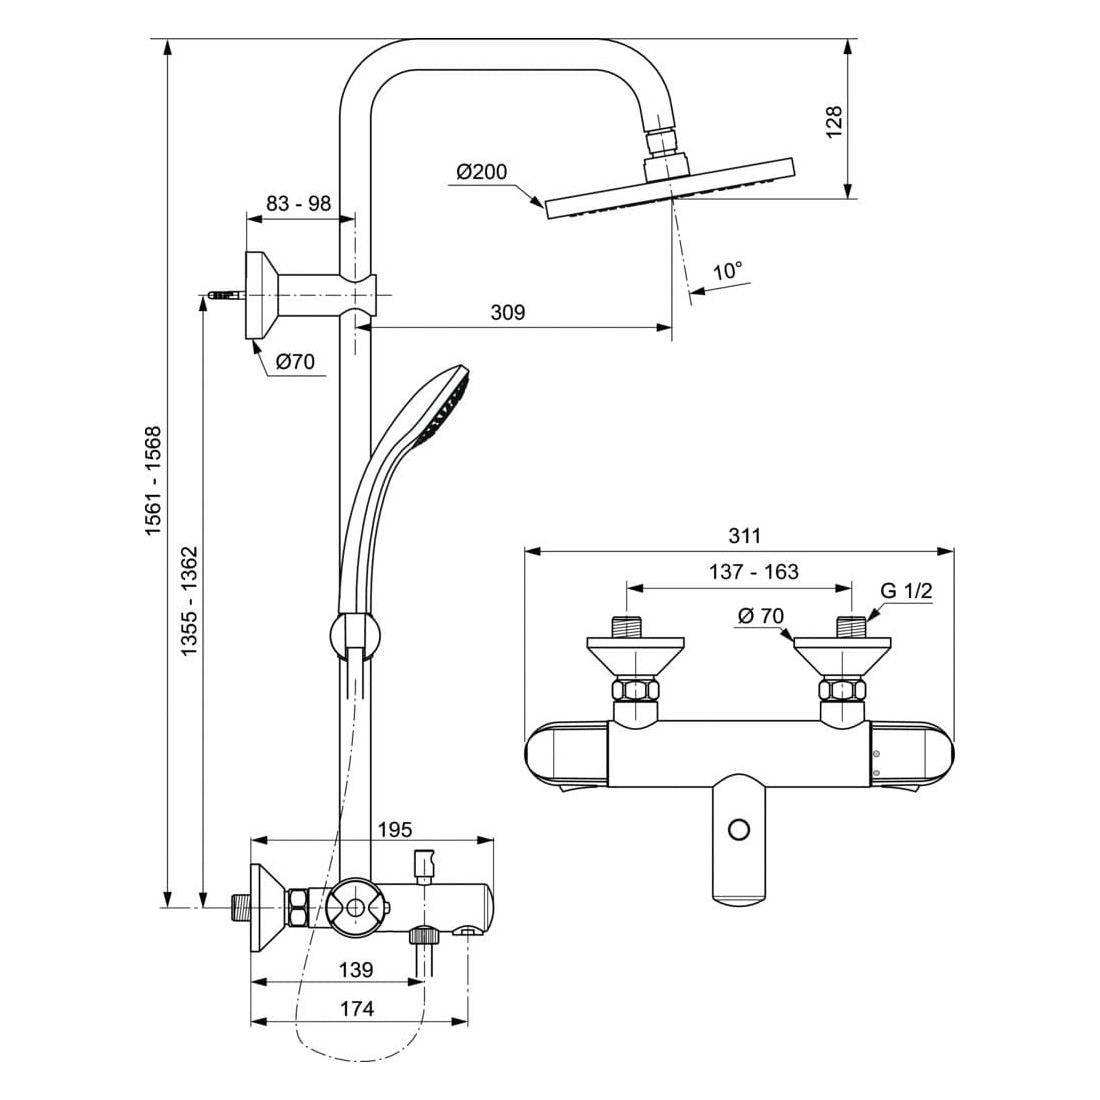 Stacionari dušo sistema Ideal Standard, Ceratherm 25, su termostatiniu vonios maišytuvu